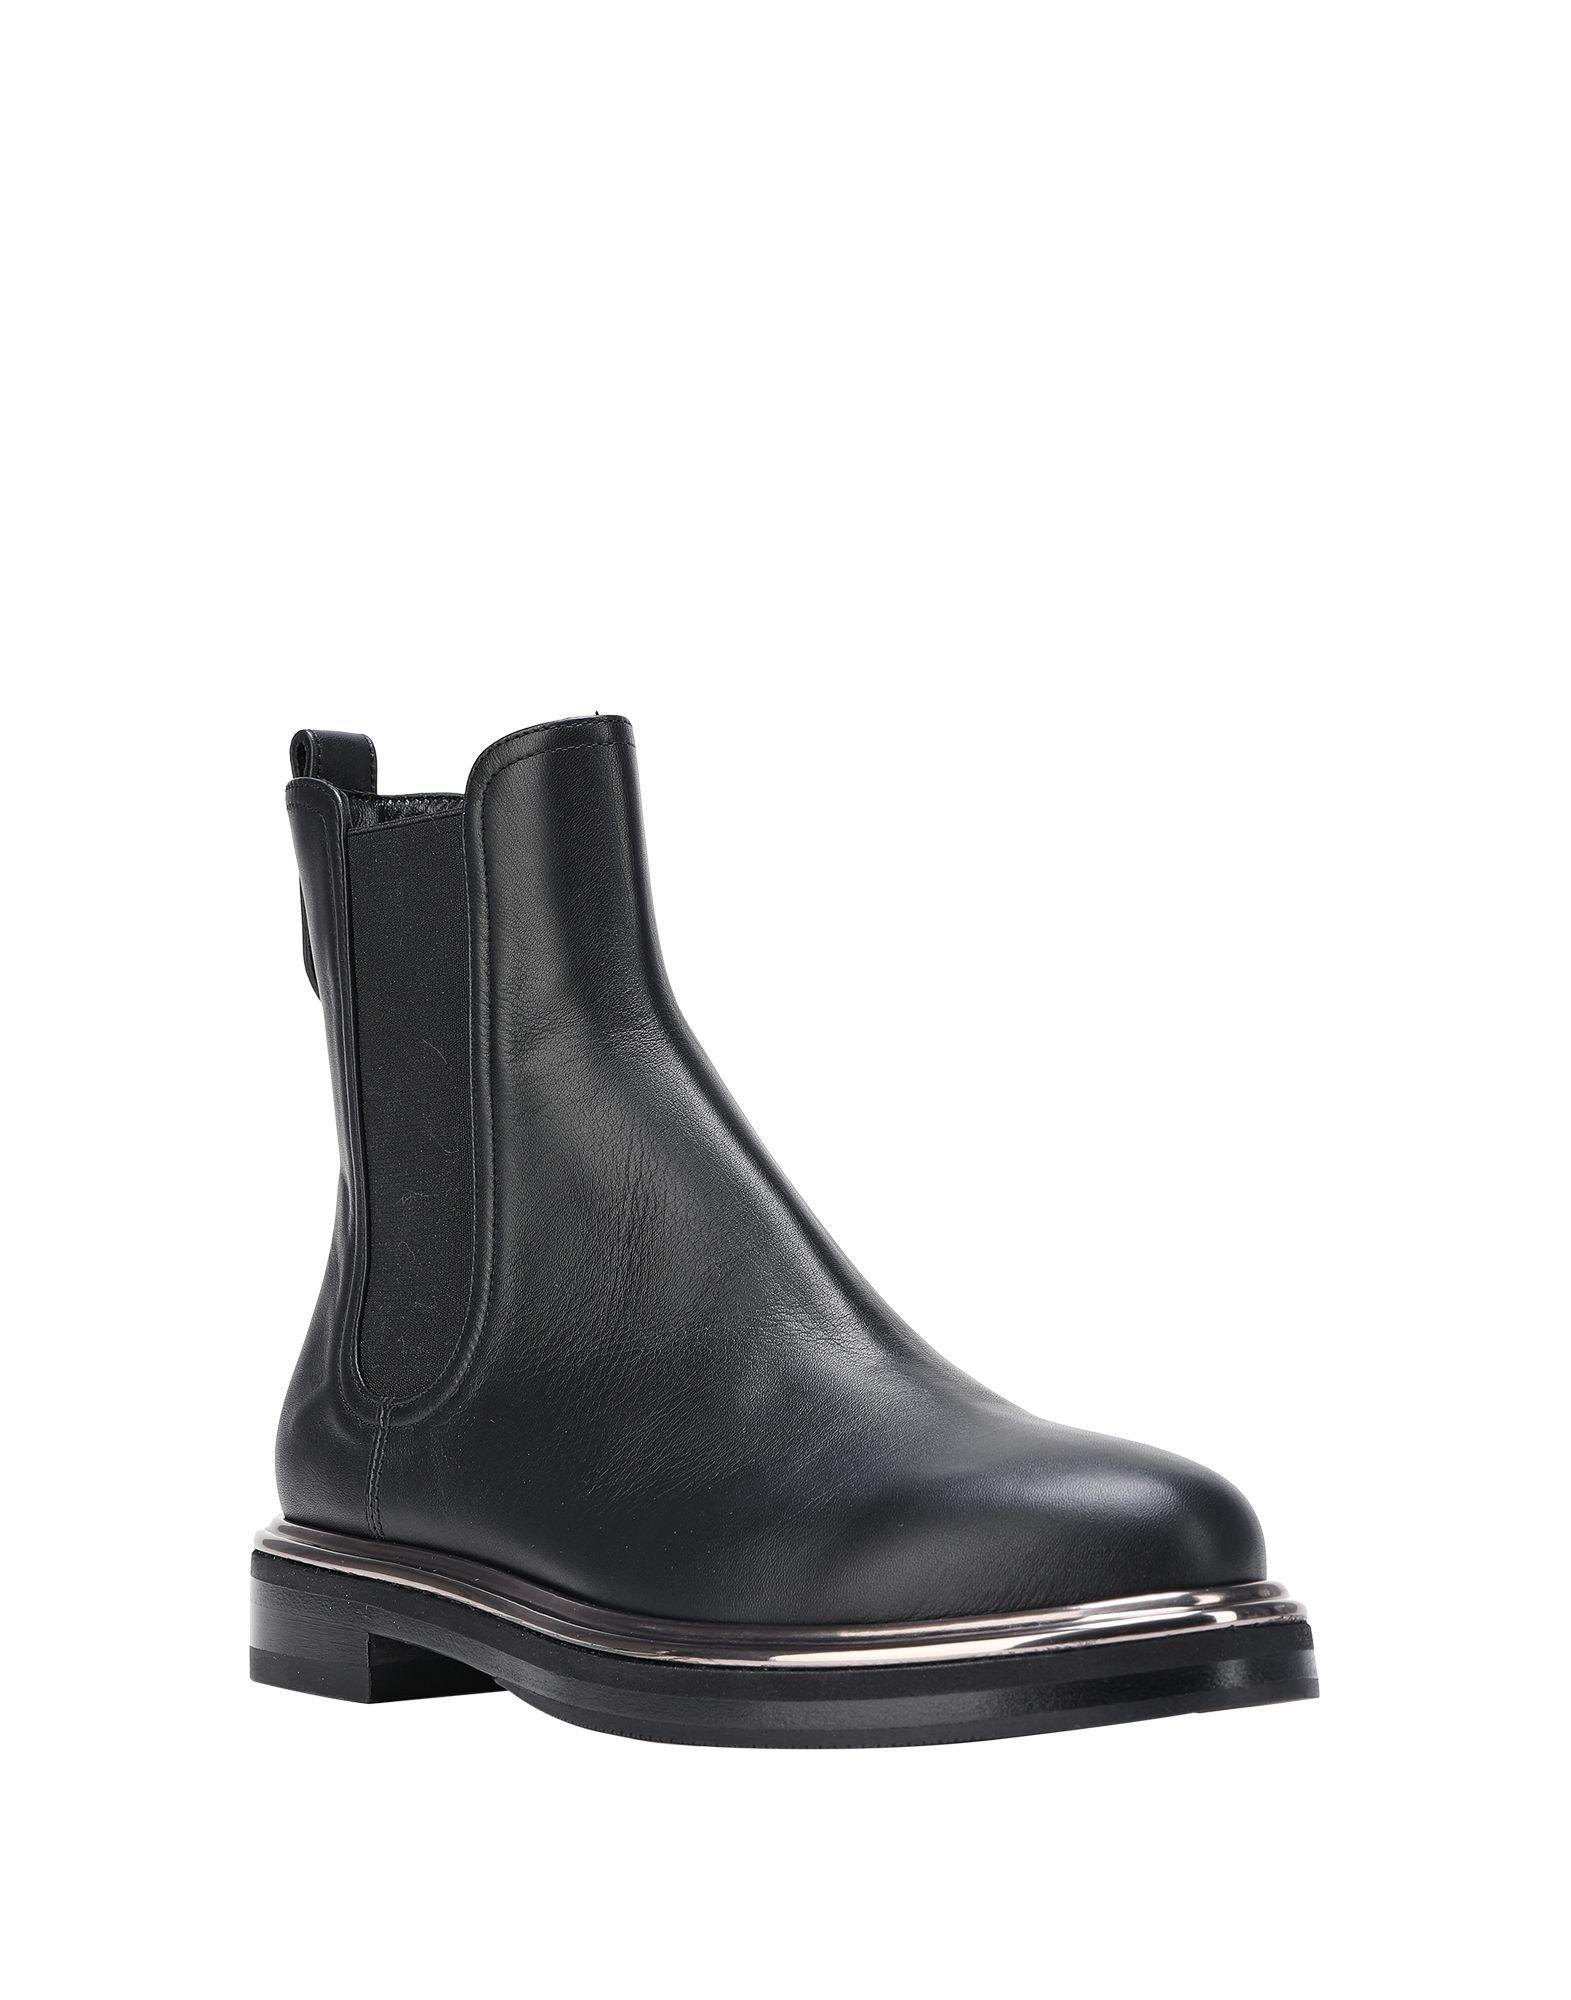 Le Silla Women's Ankle Boots Black Leather